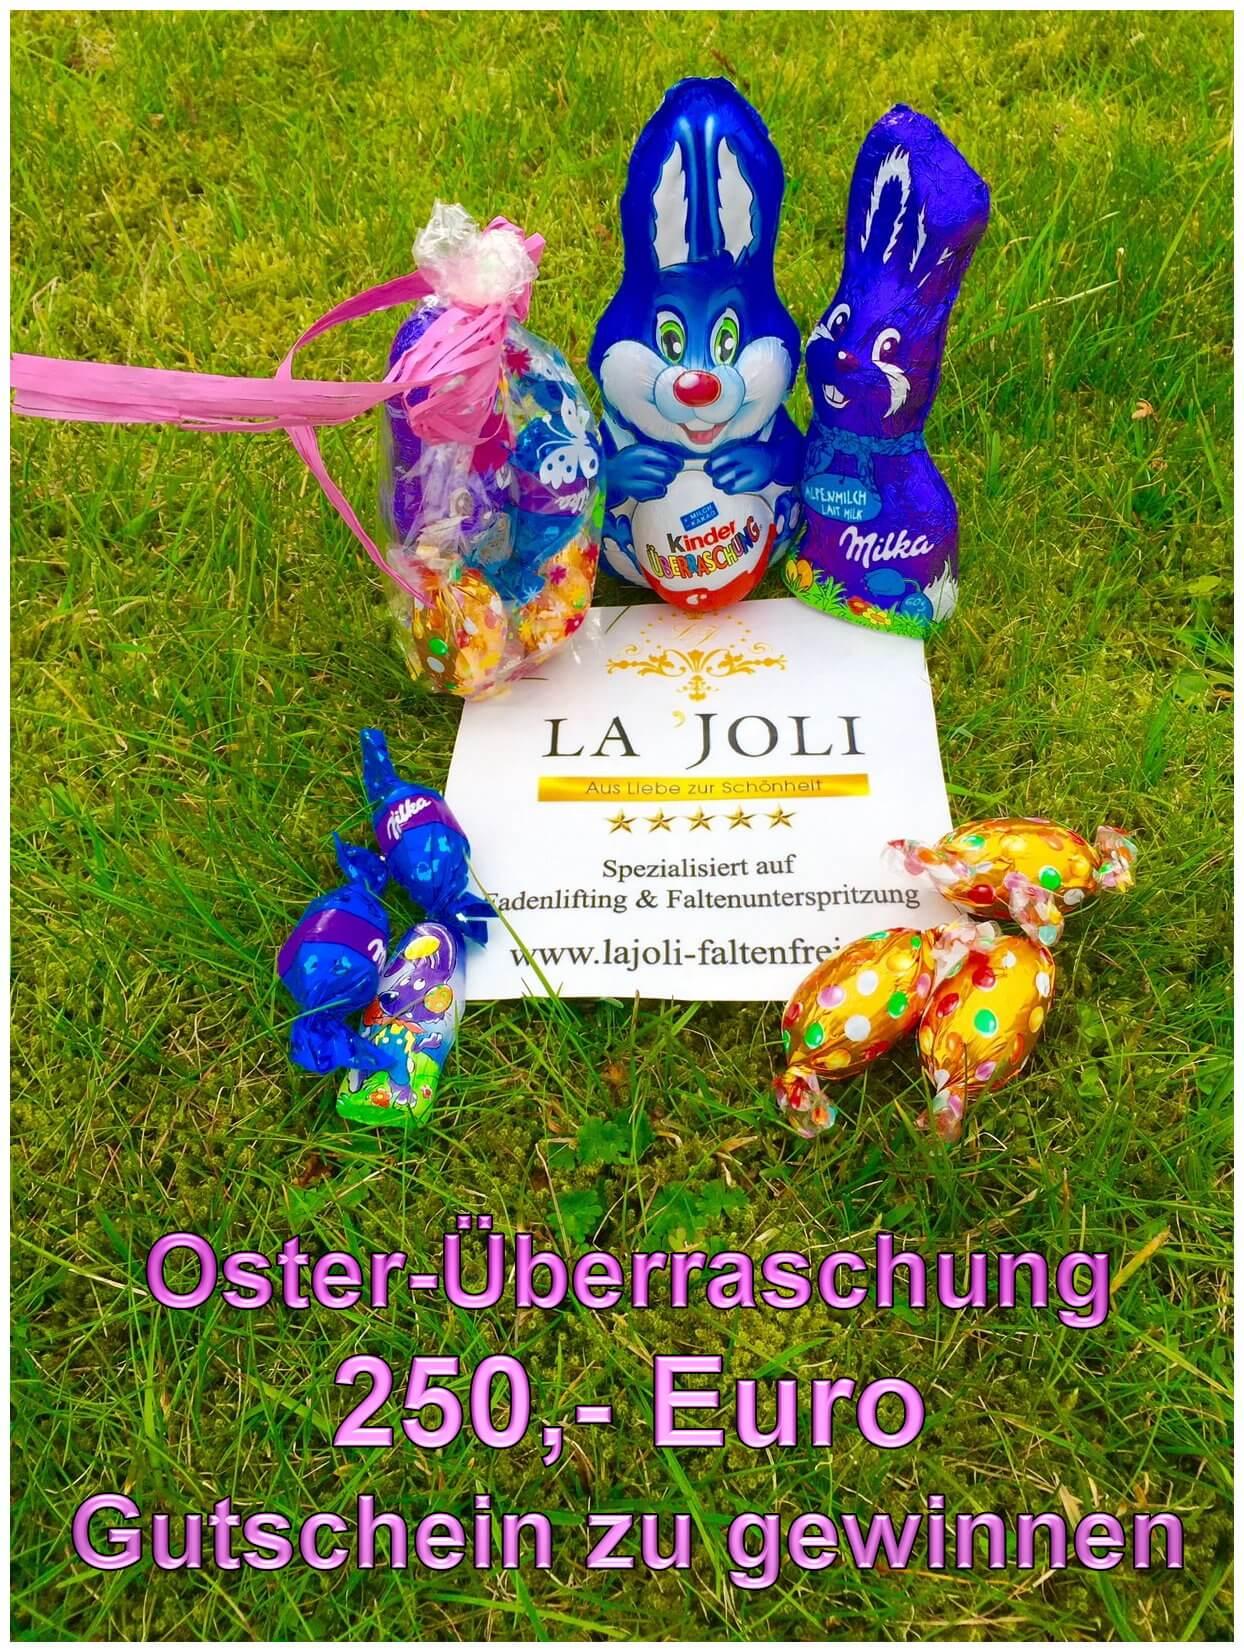 LAJOLI Oster-Gewinnspiel - Gutschein Fadenlifting